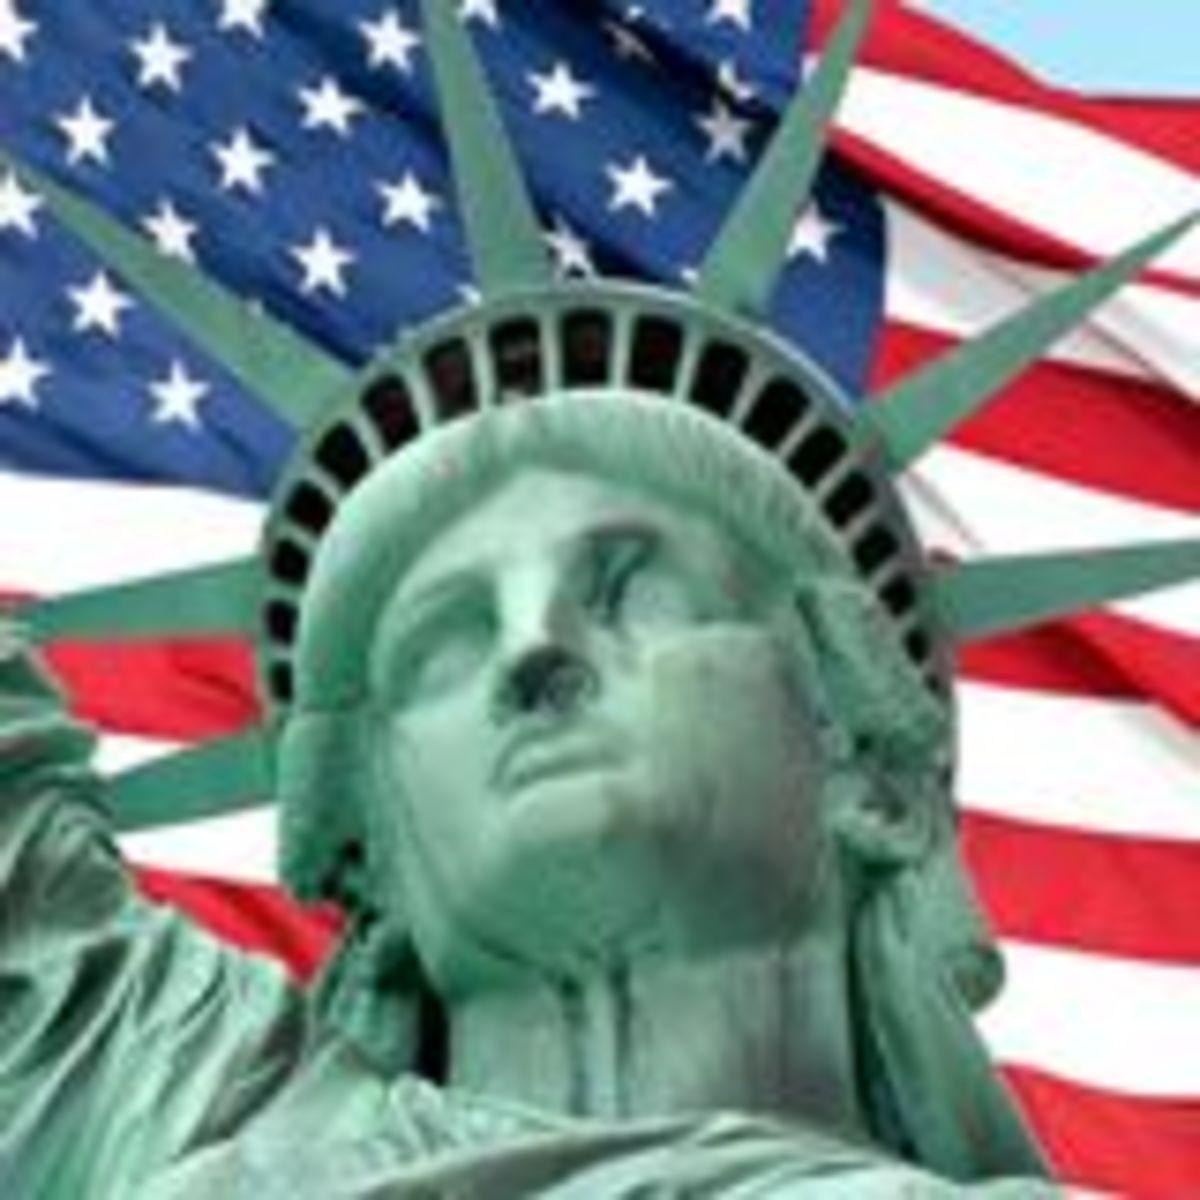 documents-checklist-for-non-immigrant-visa-interview-l1-h1b-b1-b2-f1-m1-visas